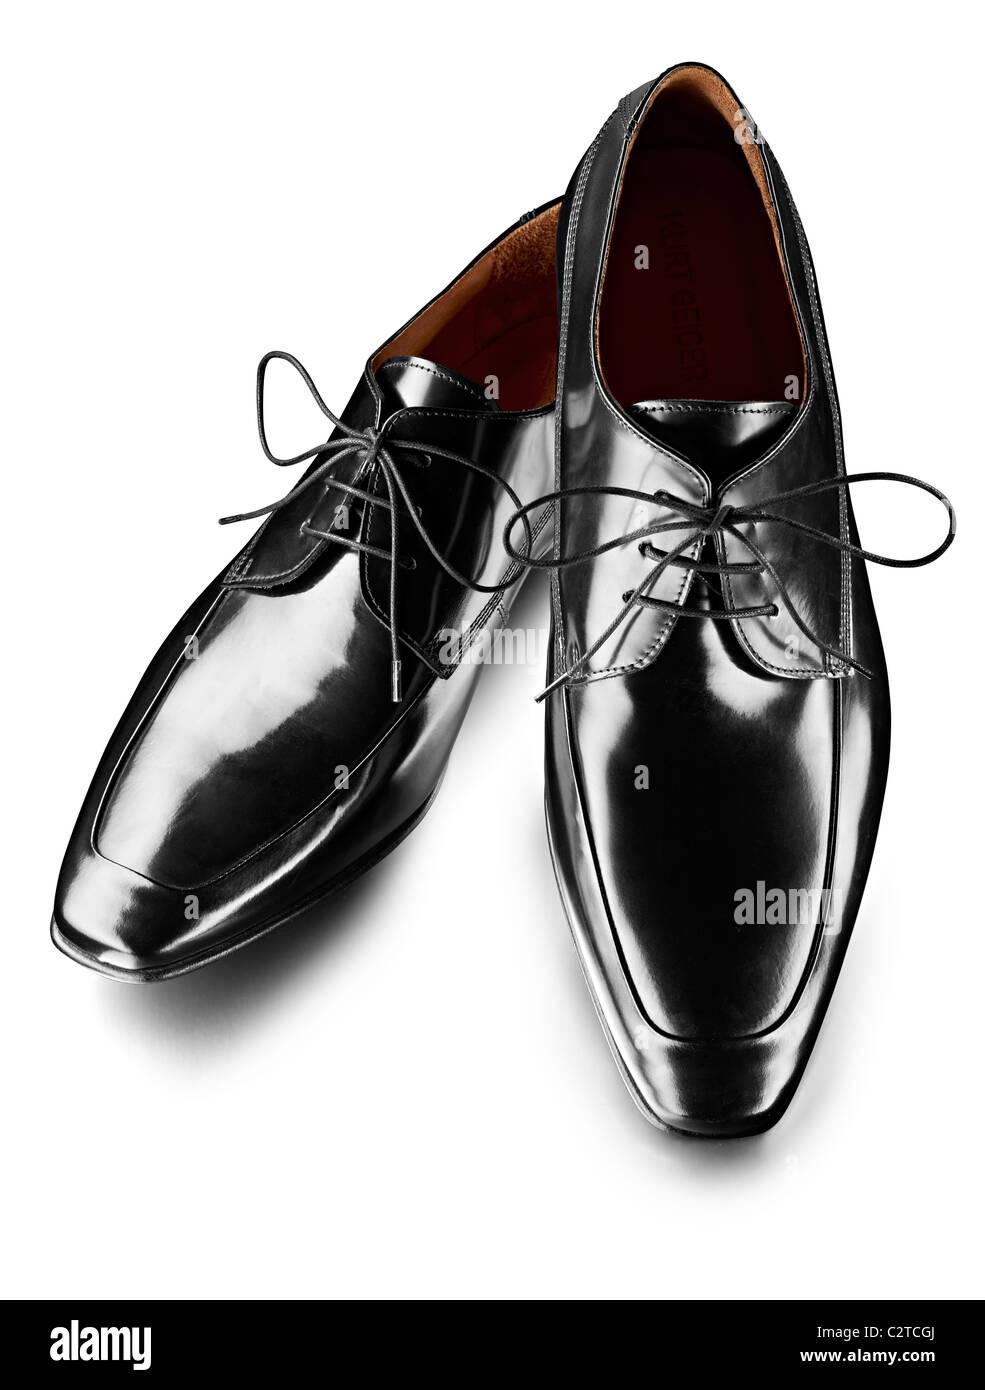 Mens zapatos de charol negro Imagen De Stock